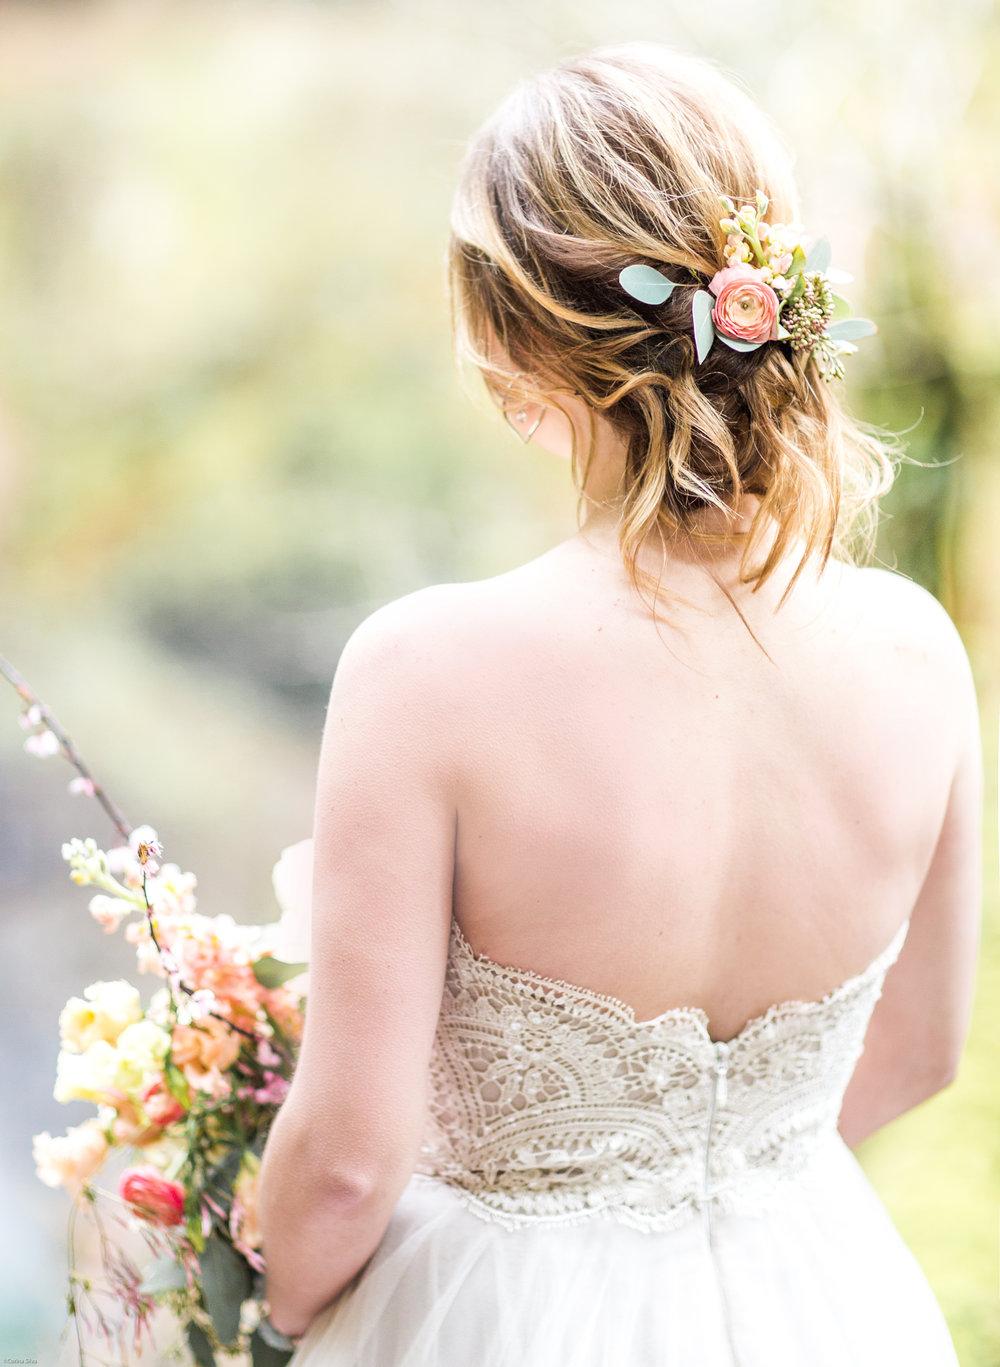 Silver Falls-elopement-bride-and-groom-photo Corina Silva Studios-138.jpg